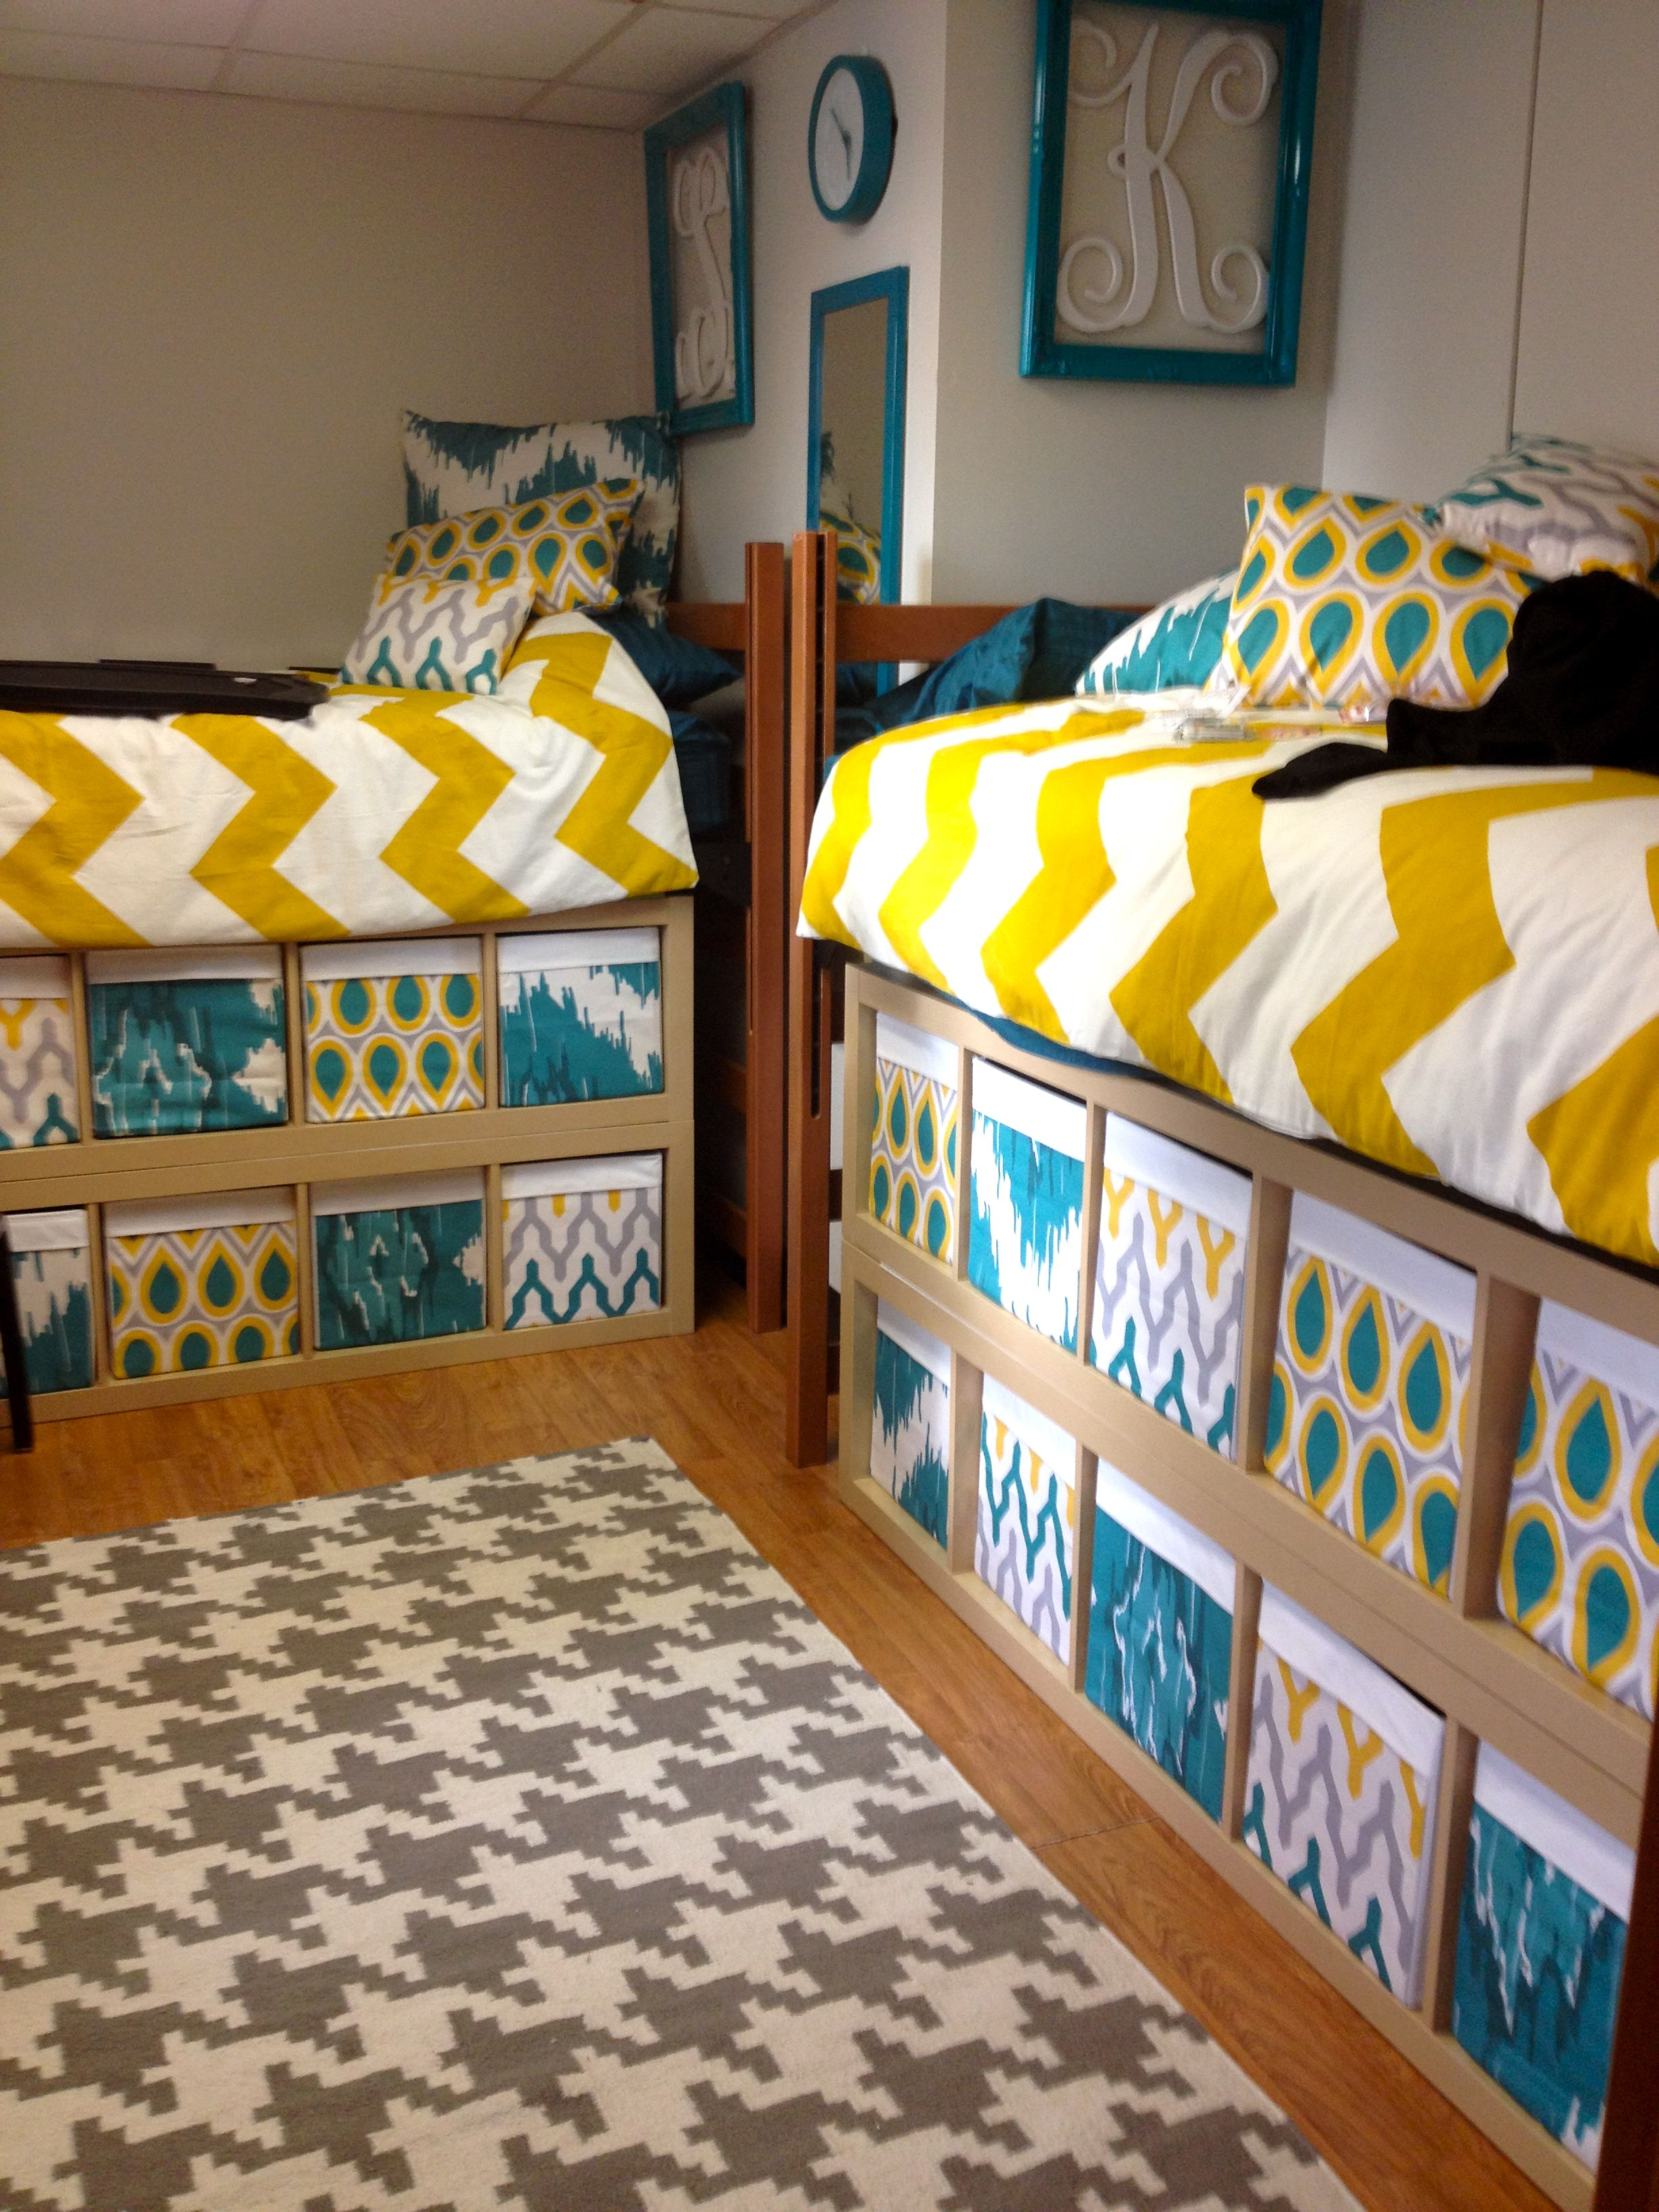 17 Smart Simple Ways To Decorate Your Dorm Room Dorm Room